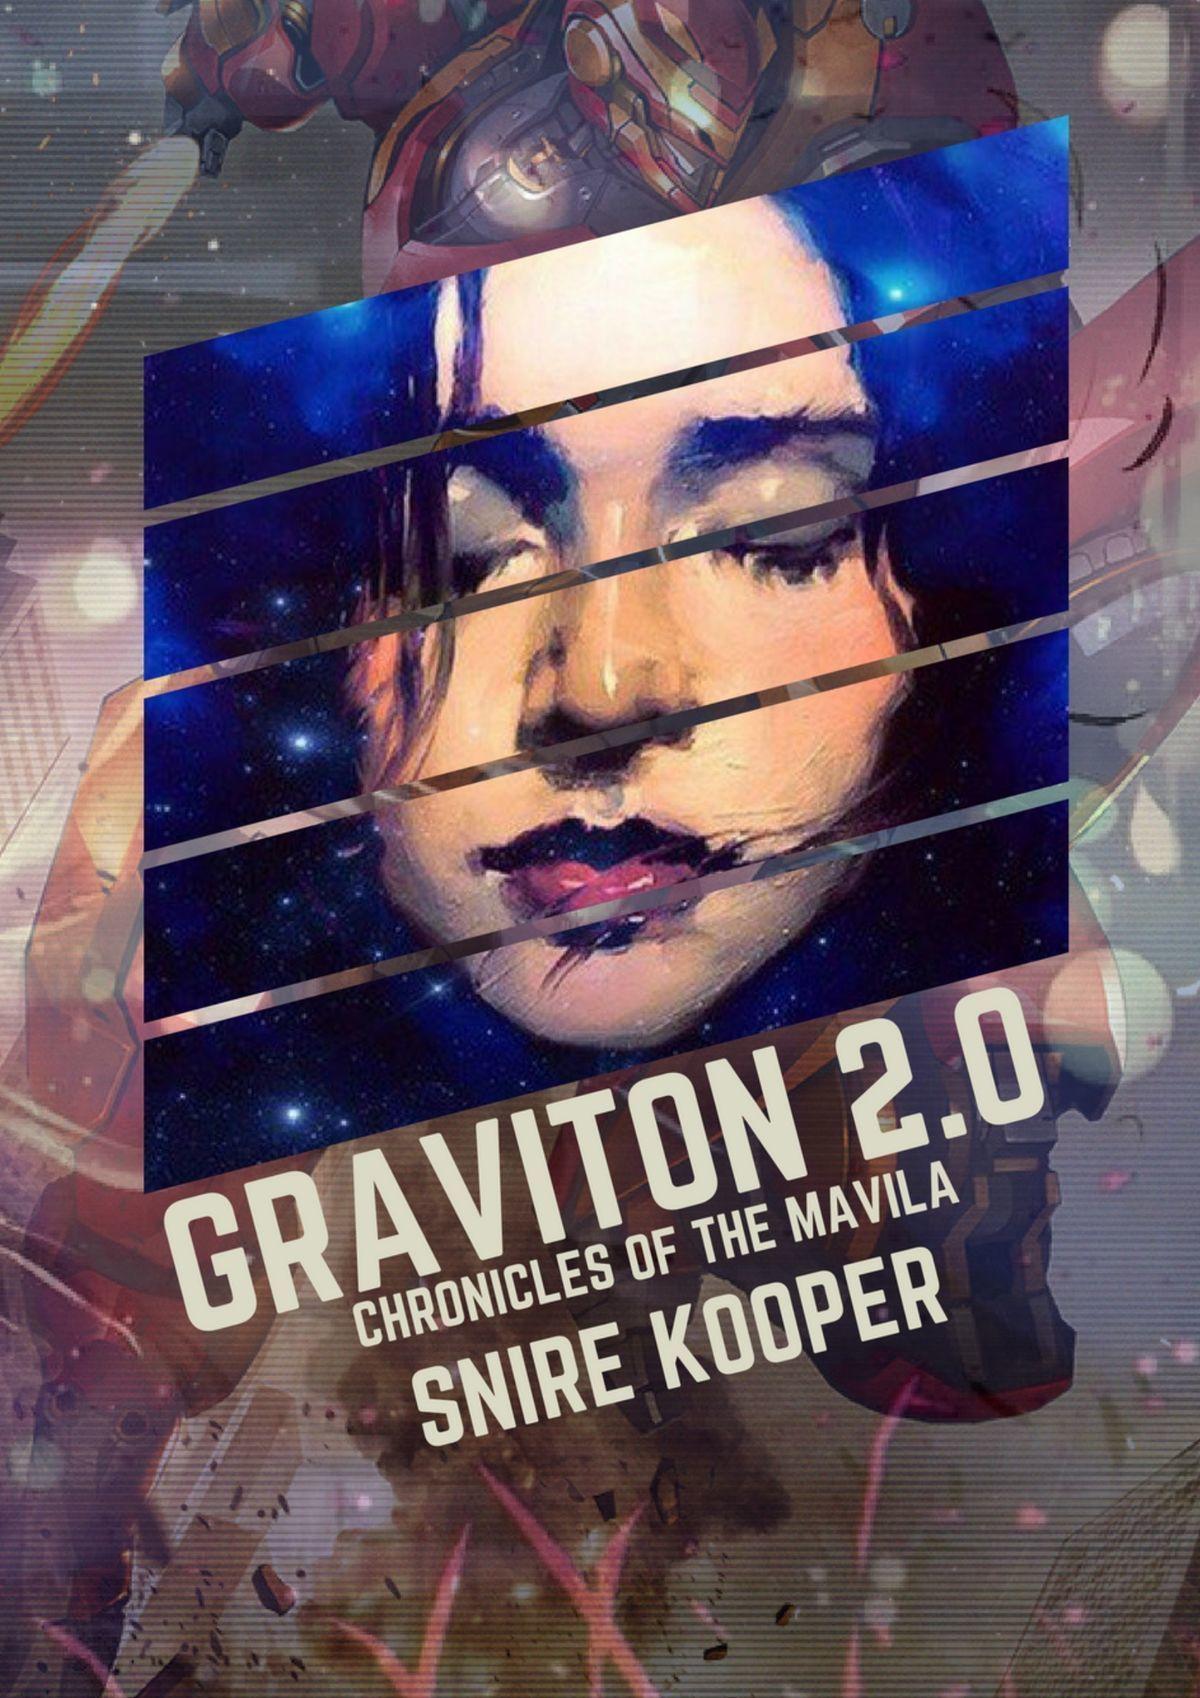 Snire Kooper - Graviton 2.0